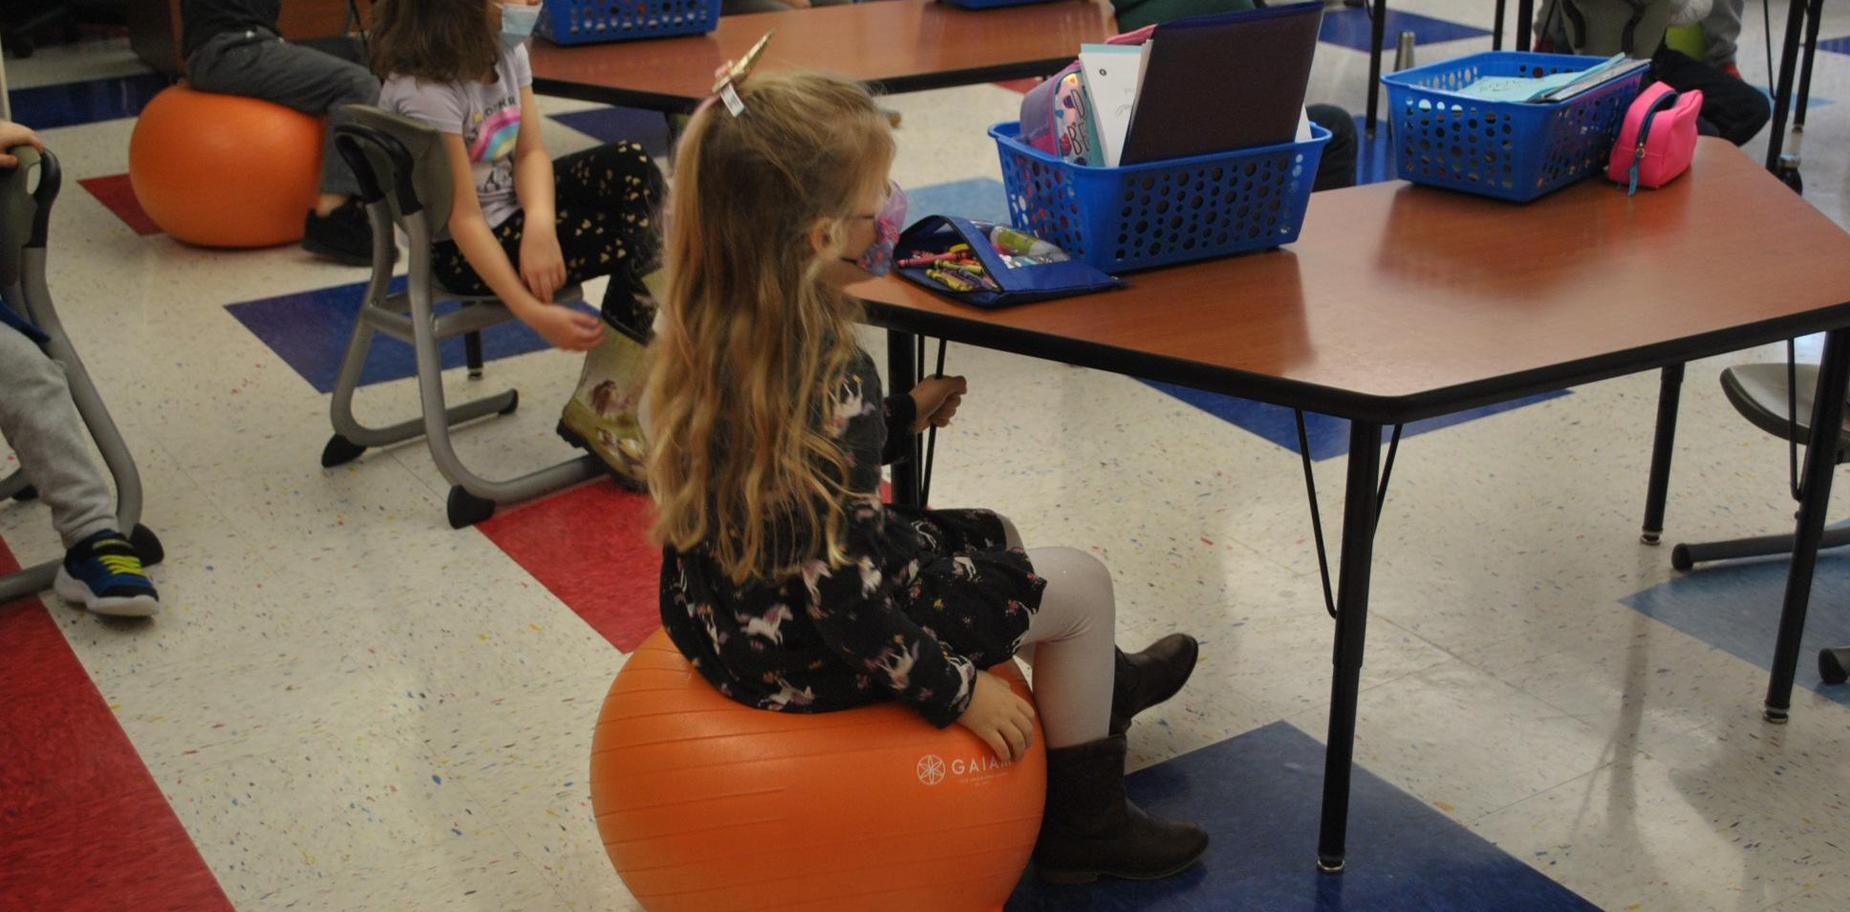 child sitting in class